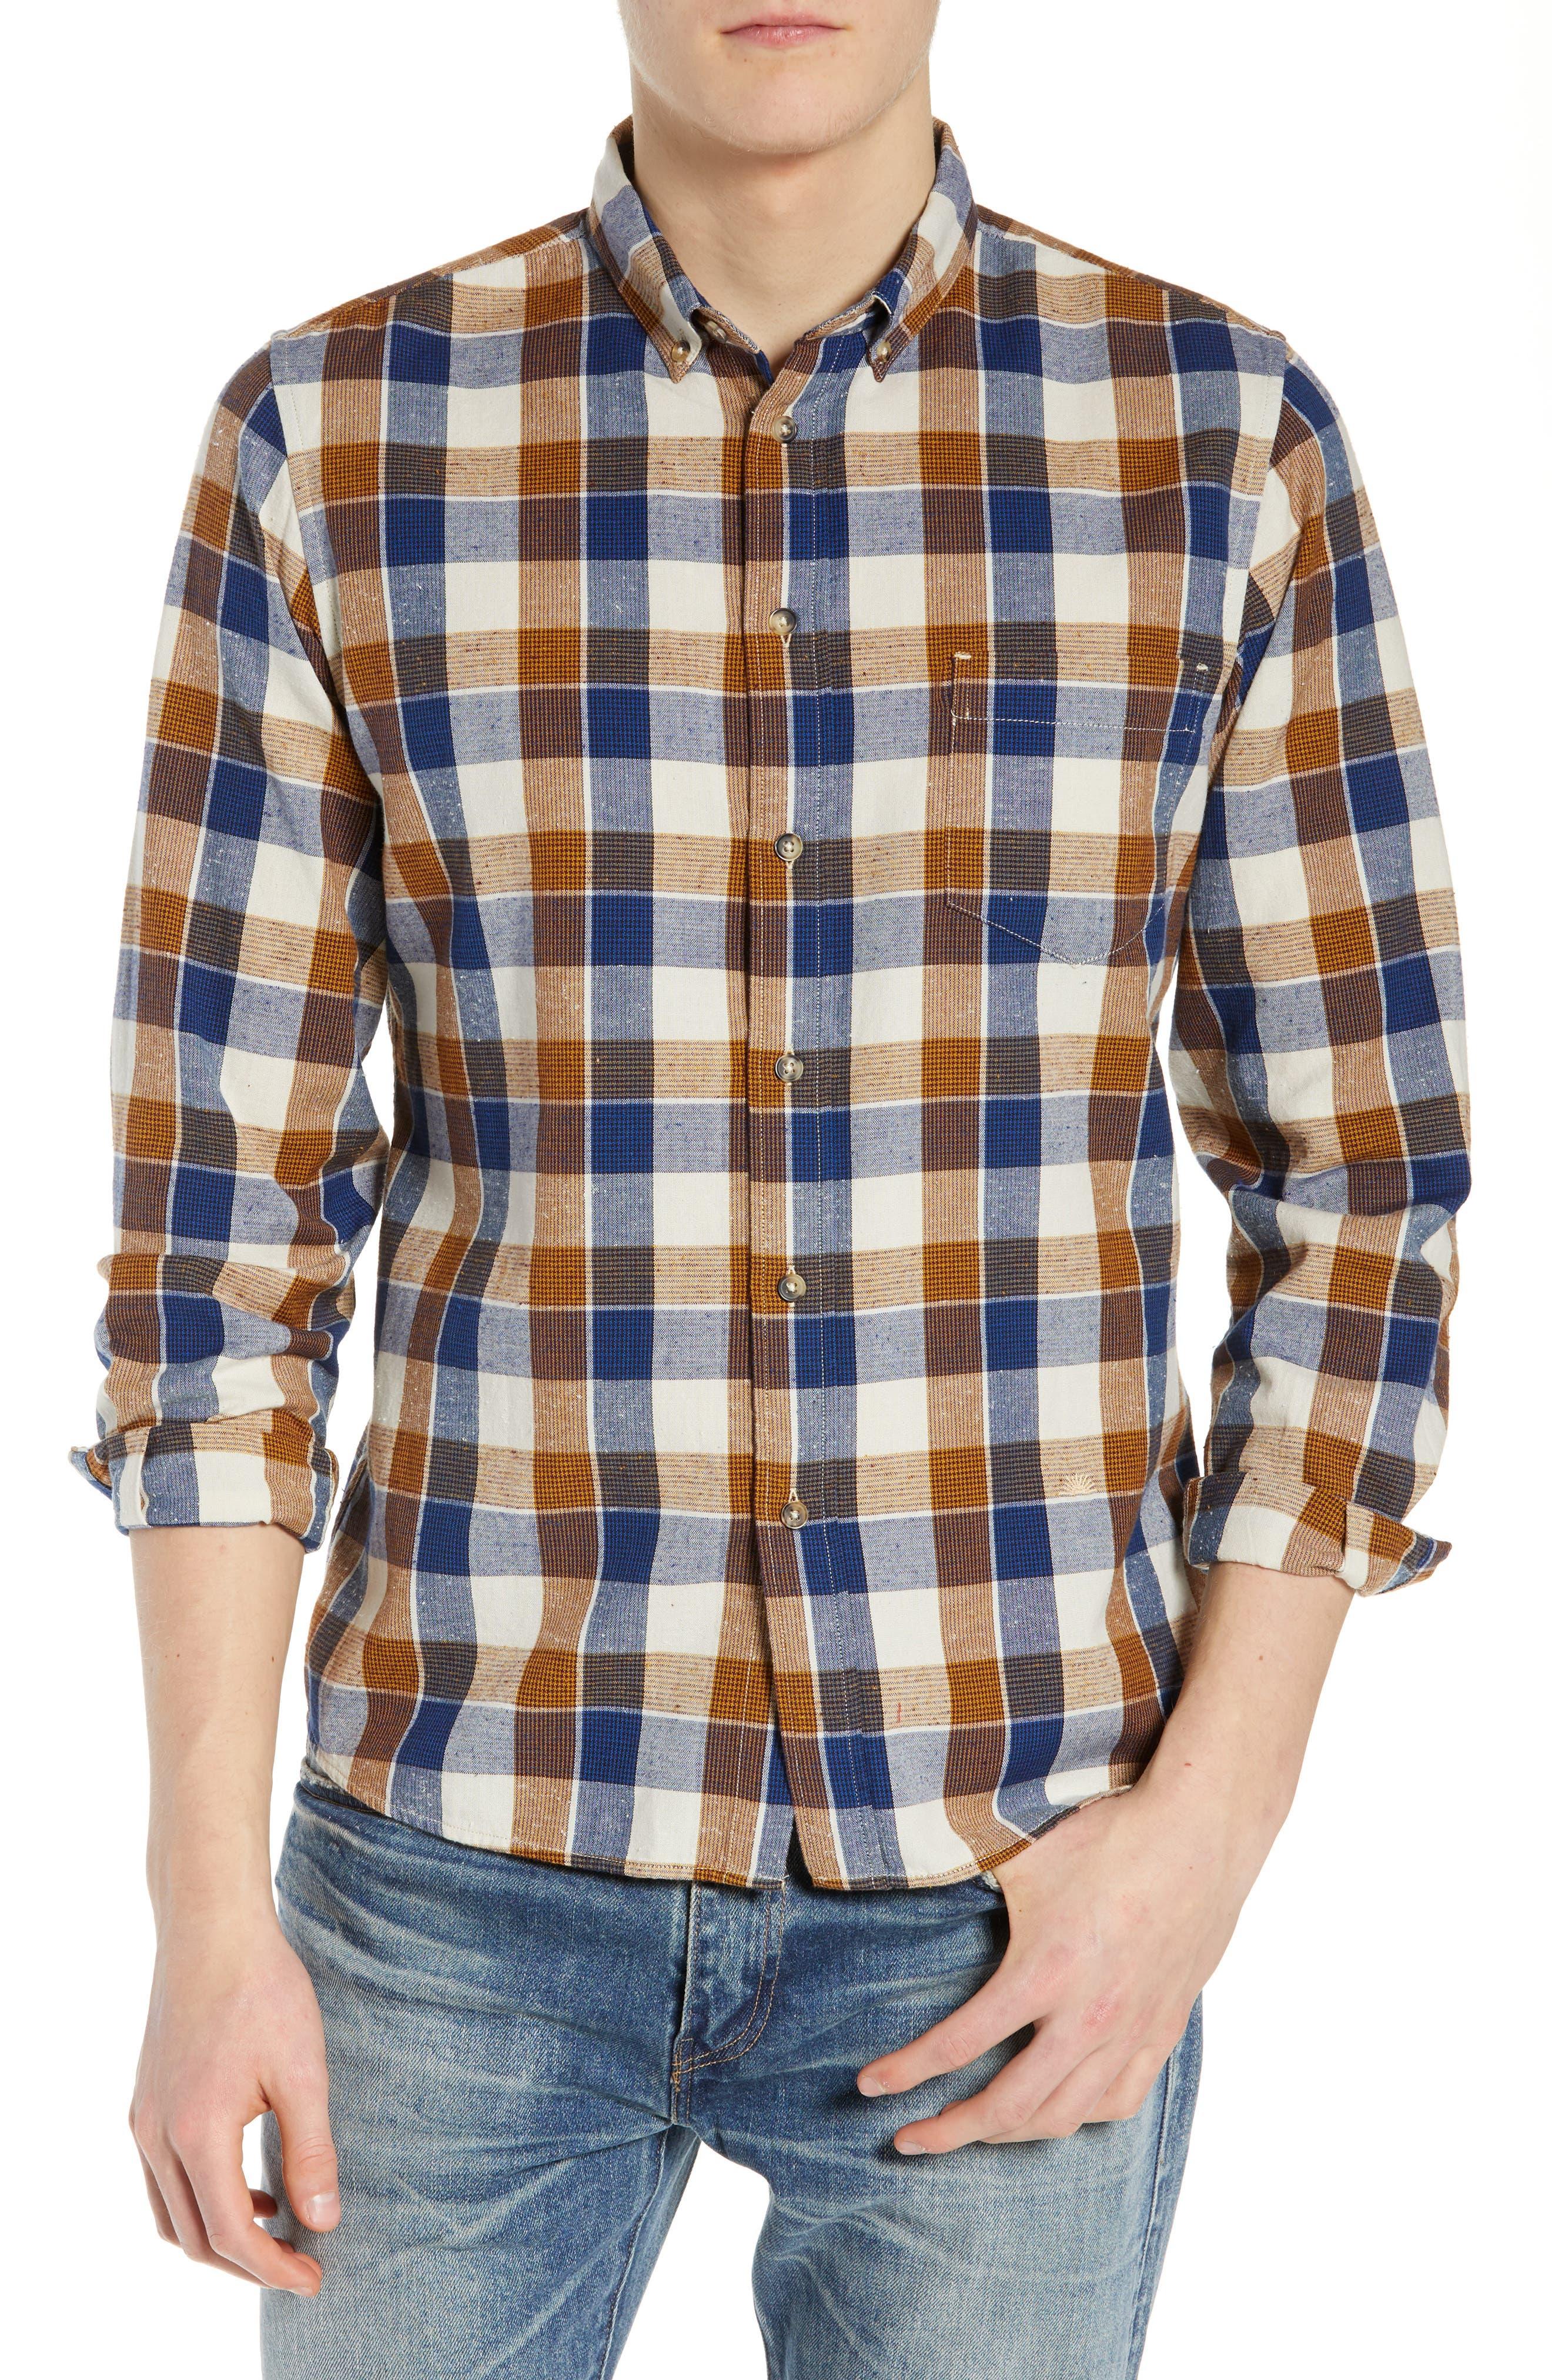 LEVI'S<SUP>®</SUP> MADE & CRAFTED<SUP>™</SUP> Standard Plaid Sport Shirt, Main, color, LEON PLAID MULTI